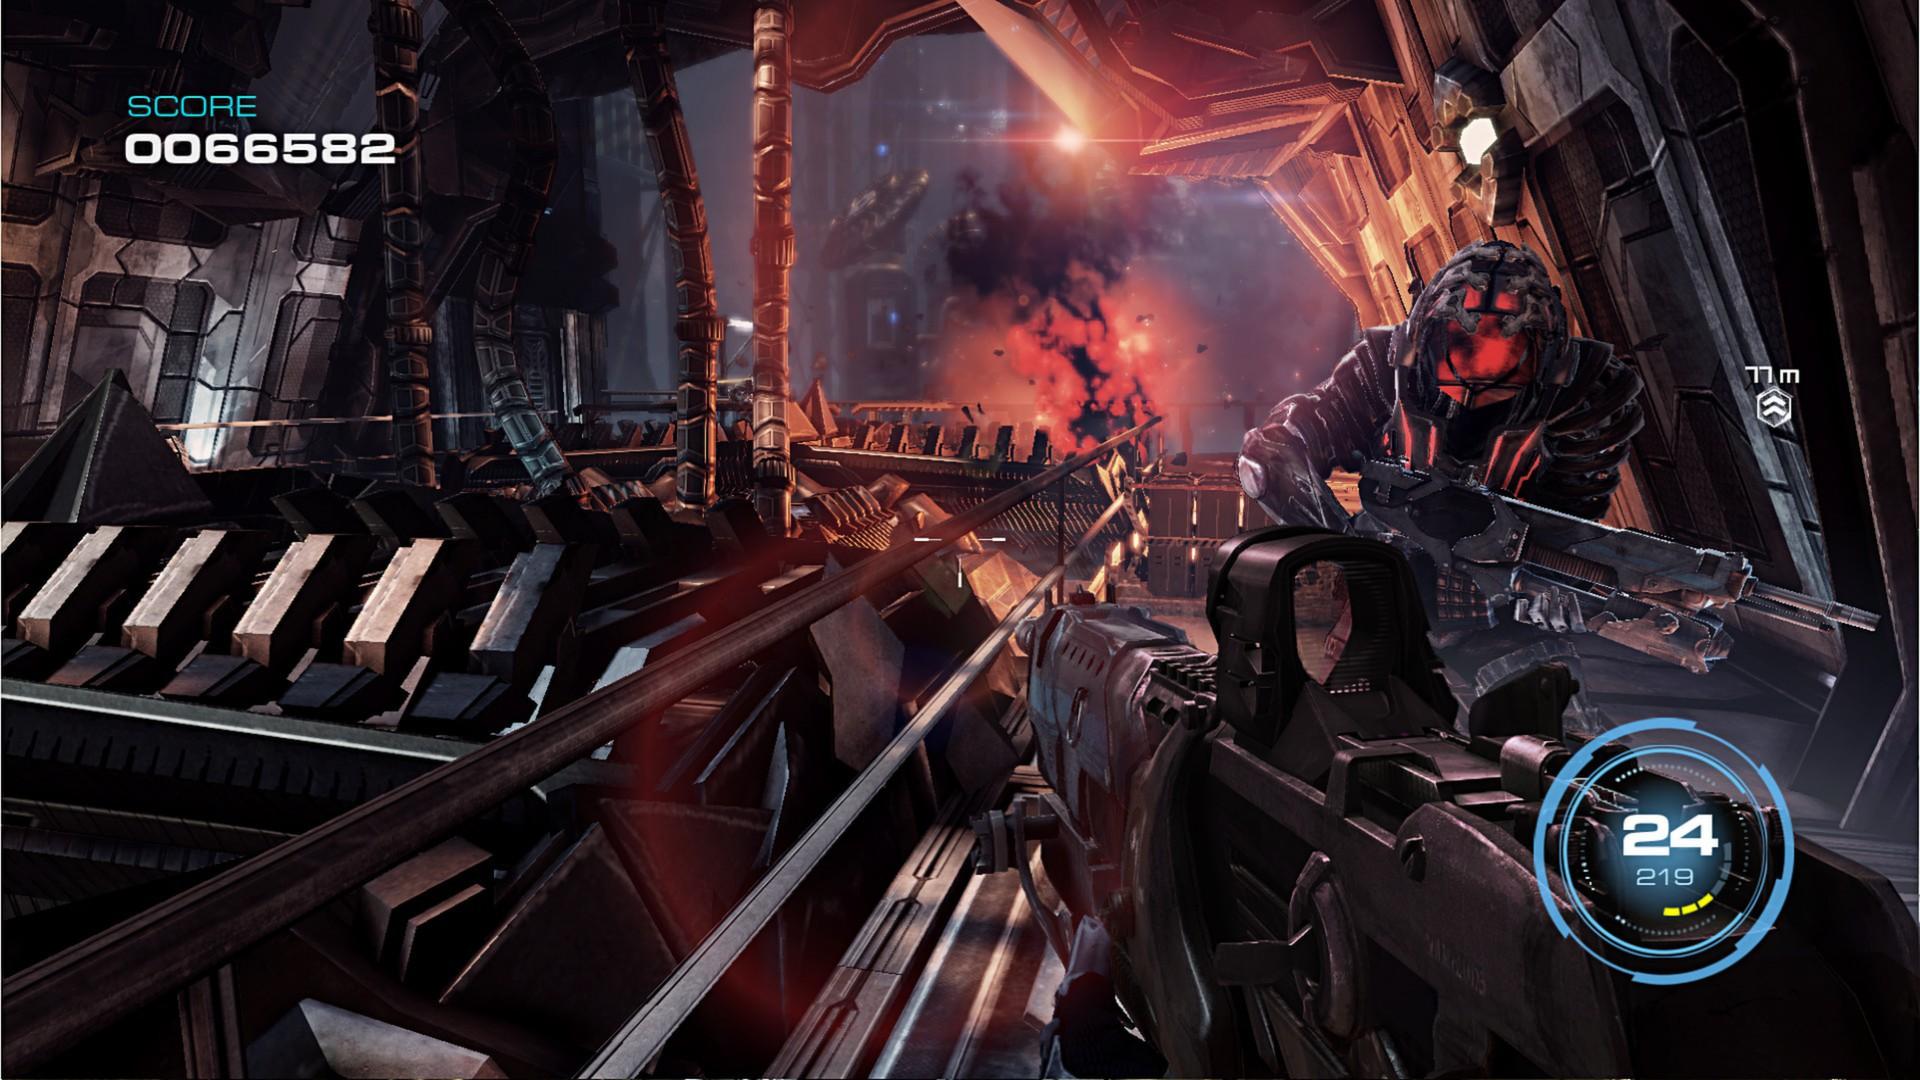 Rage (video game) - Wikipedia